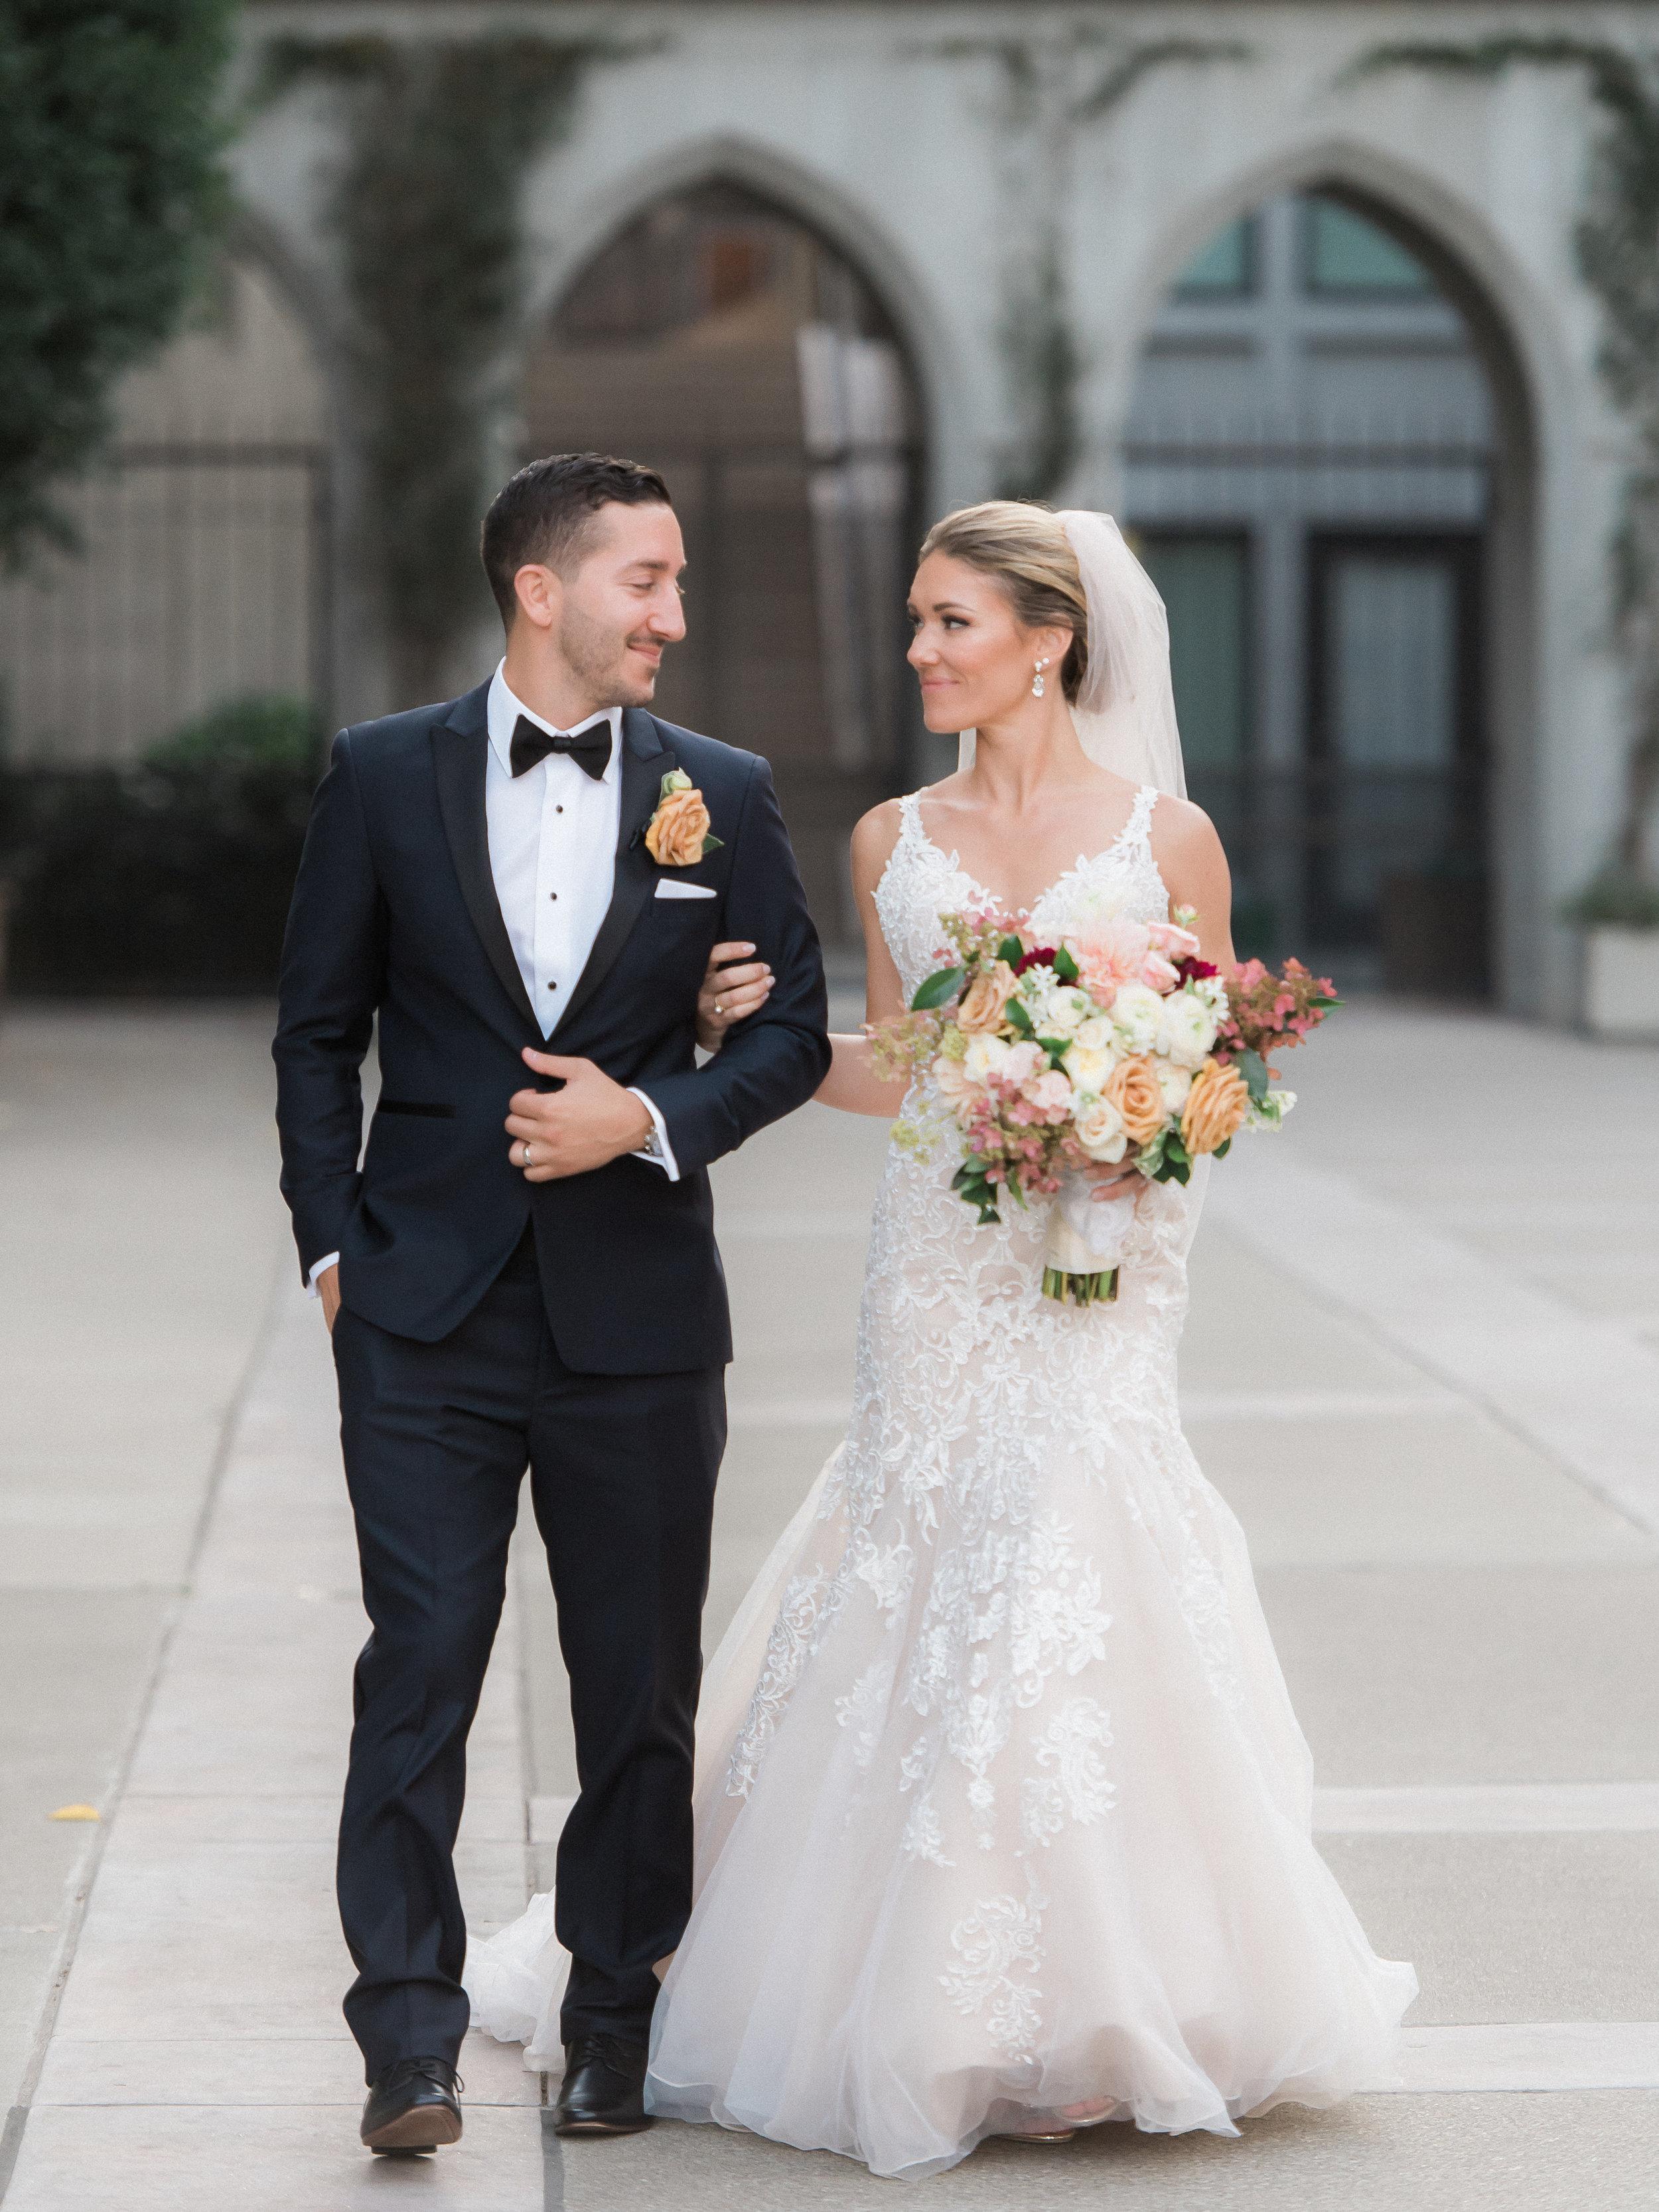 Katie+Nick_wedding_spp-blog-85.jpg